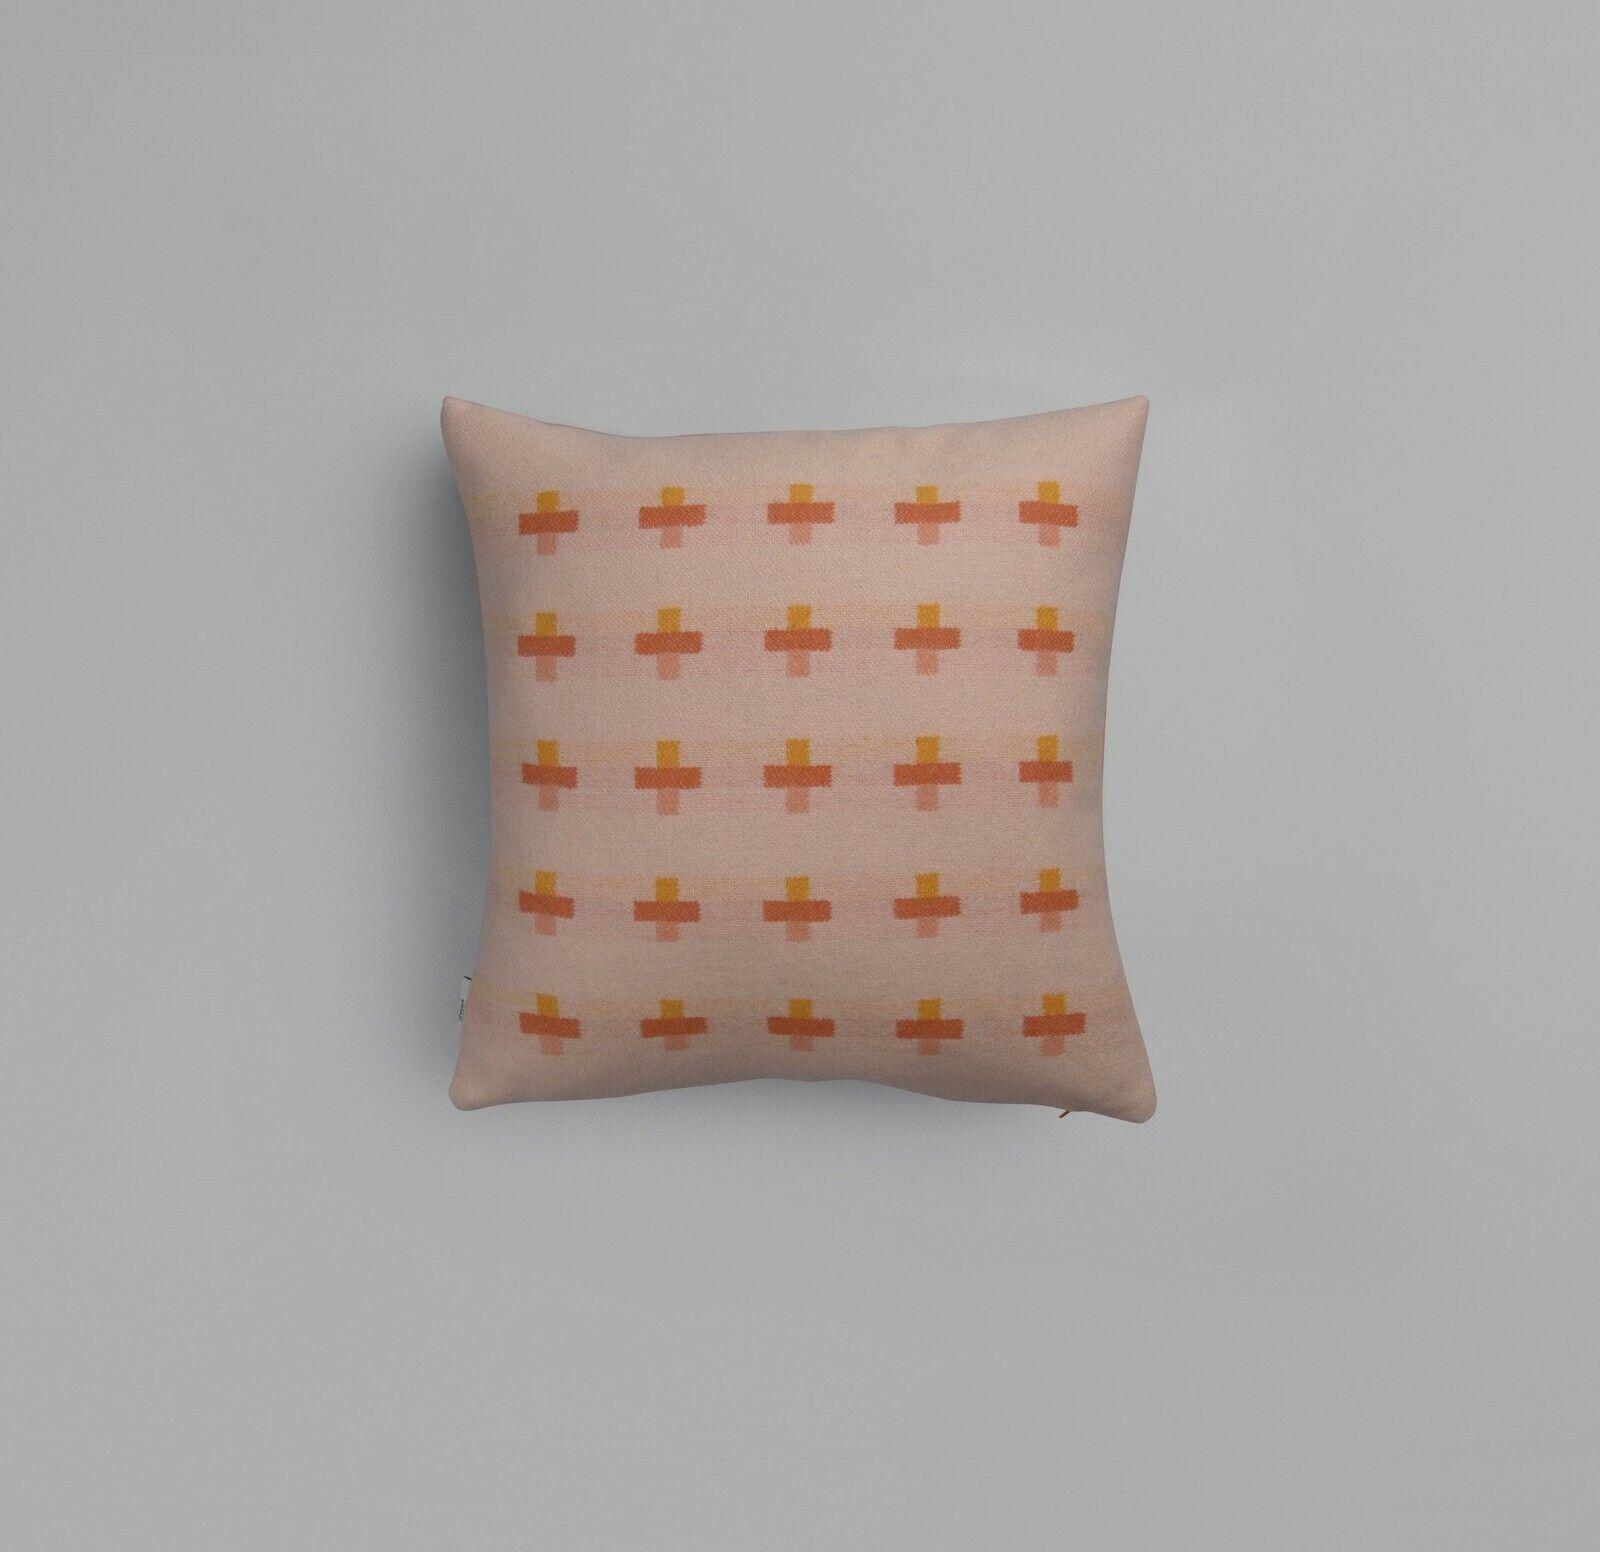 NEW  RGolds Tweed 100% Norwegian Lambswool  SYNDIN  Pillow Cushion